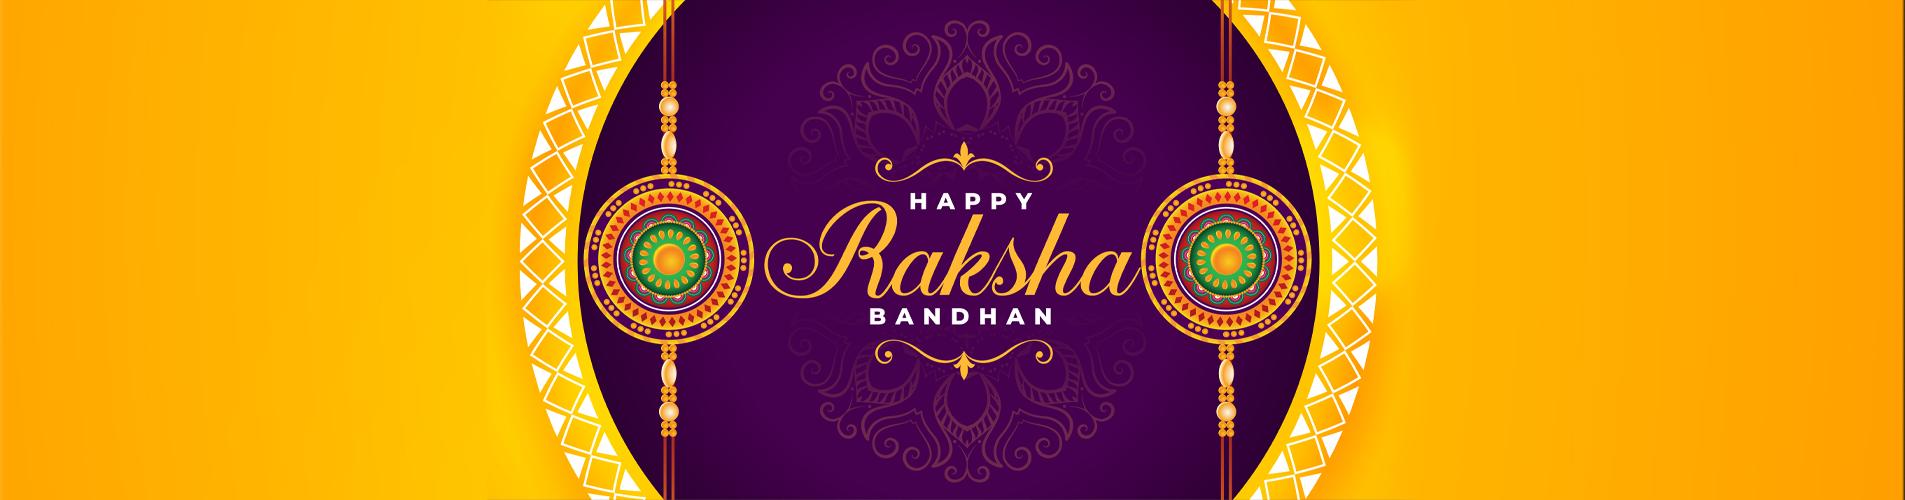 Kartmy.com Rakhsha Bandhan